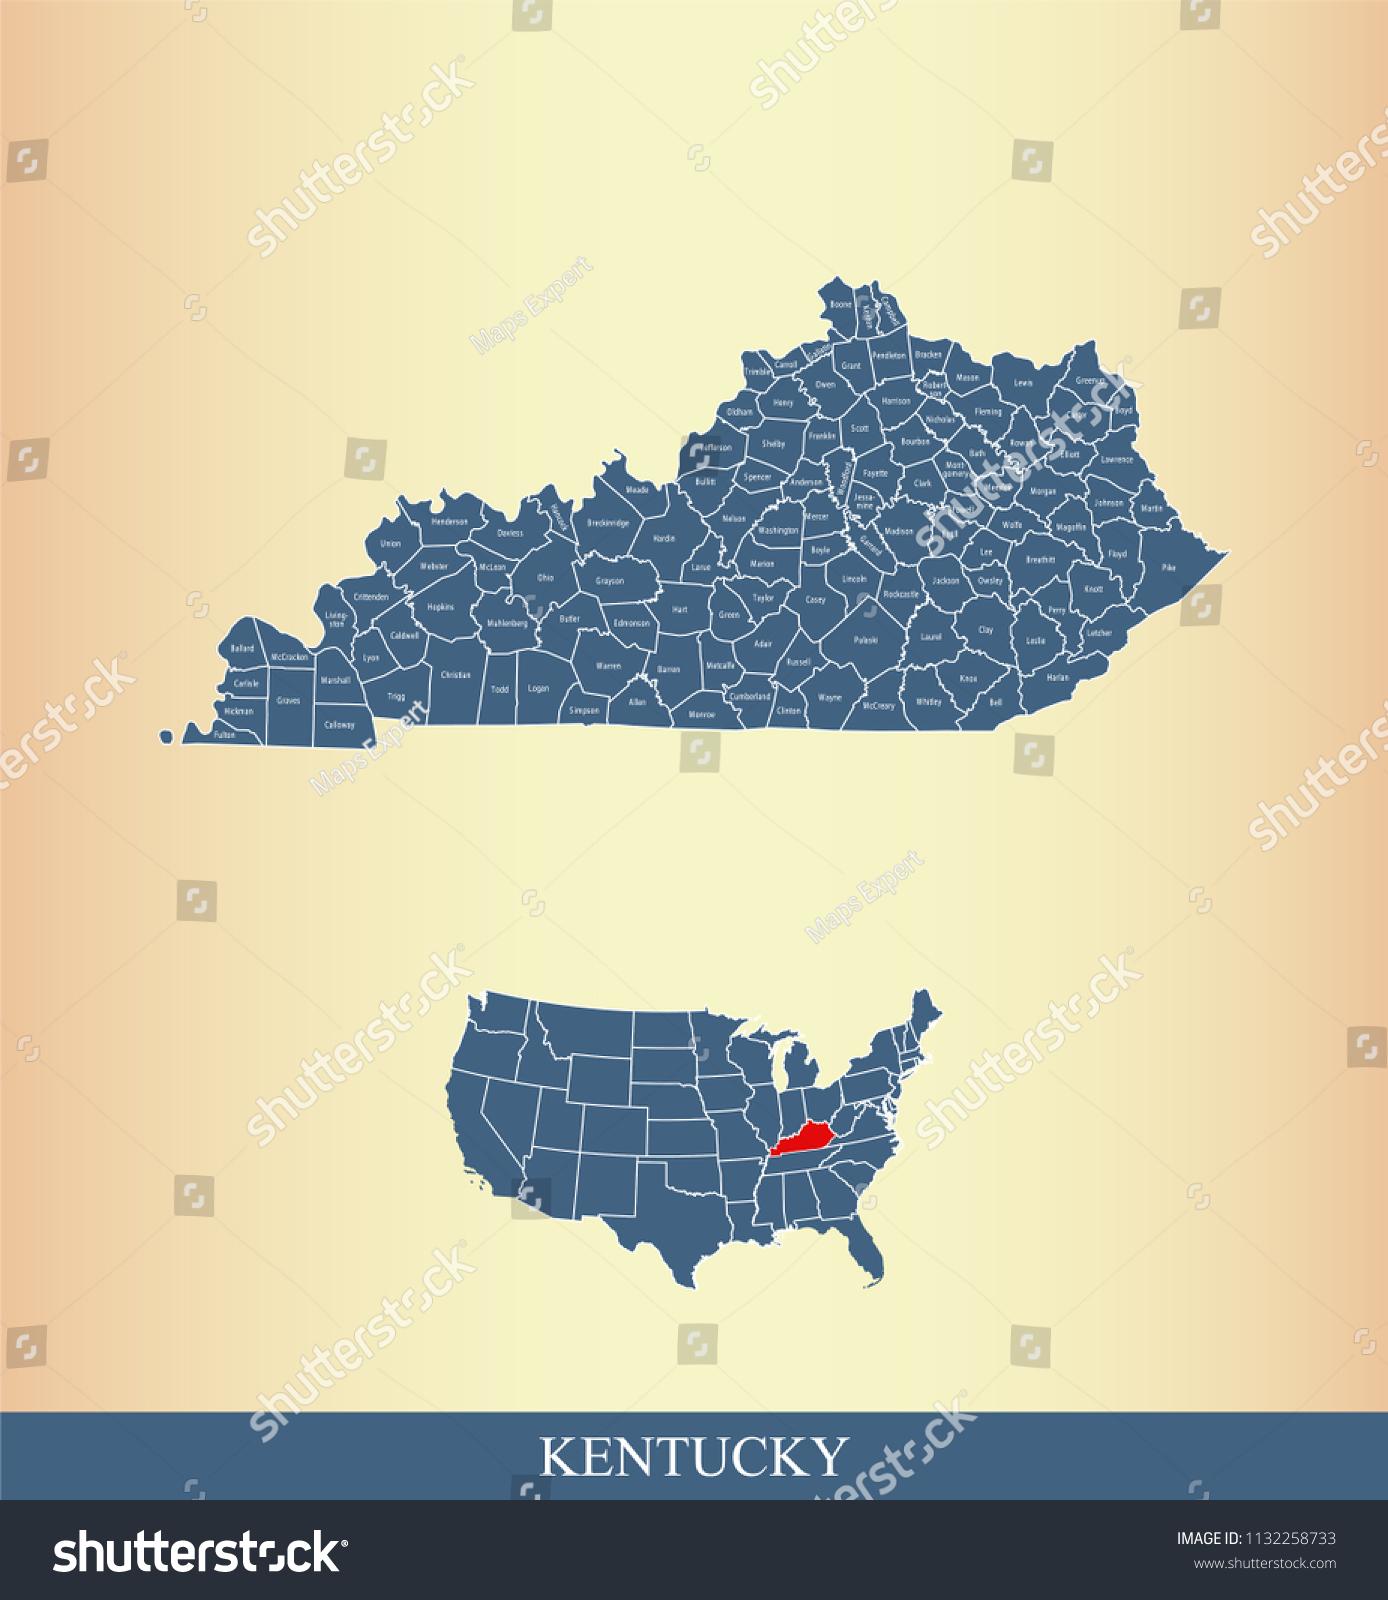 Kentucky County Map Vector Outline Counties Stock Vector ...